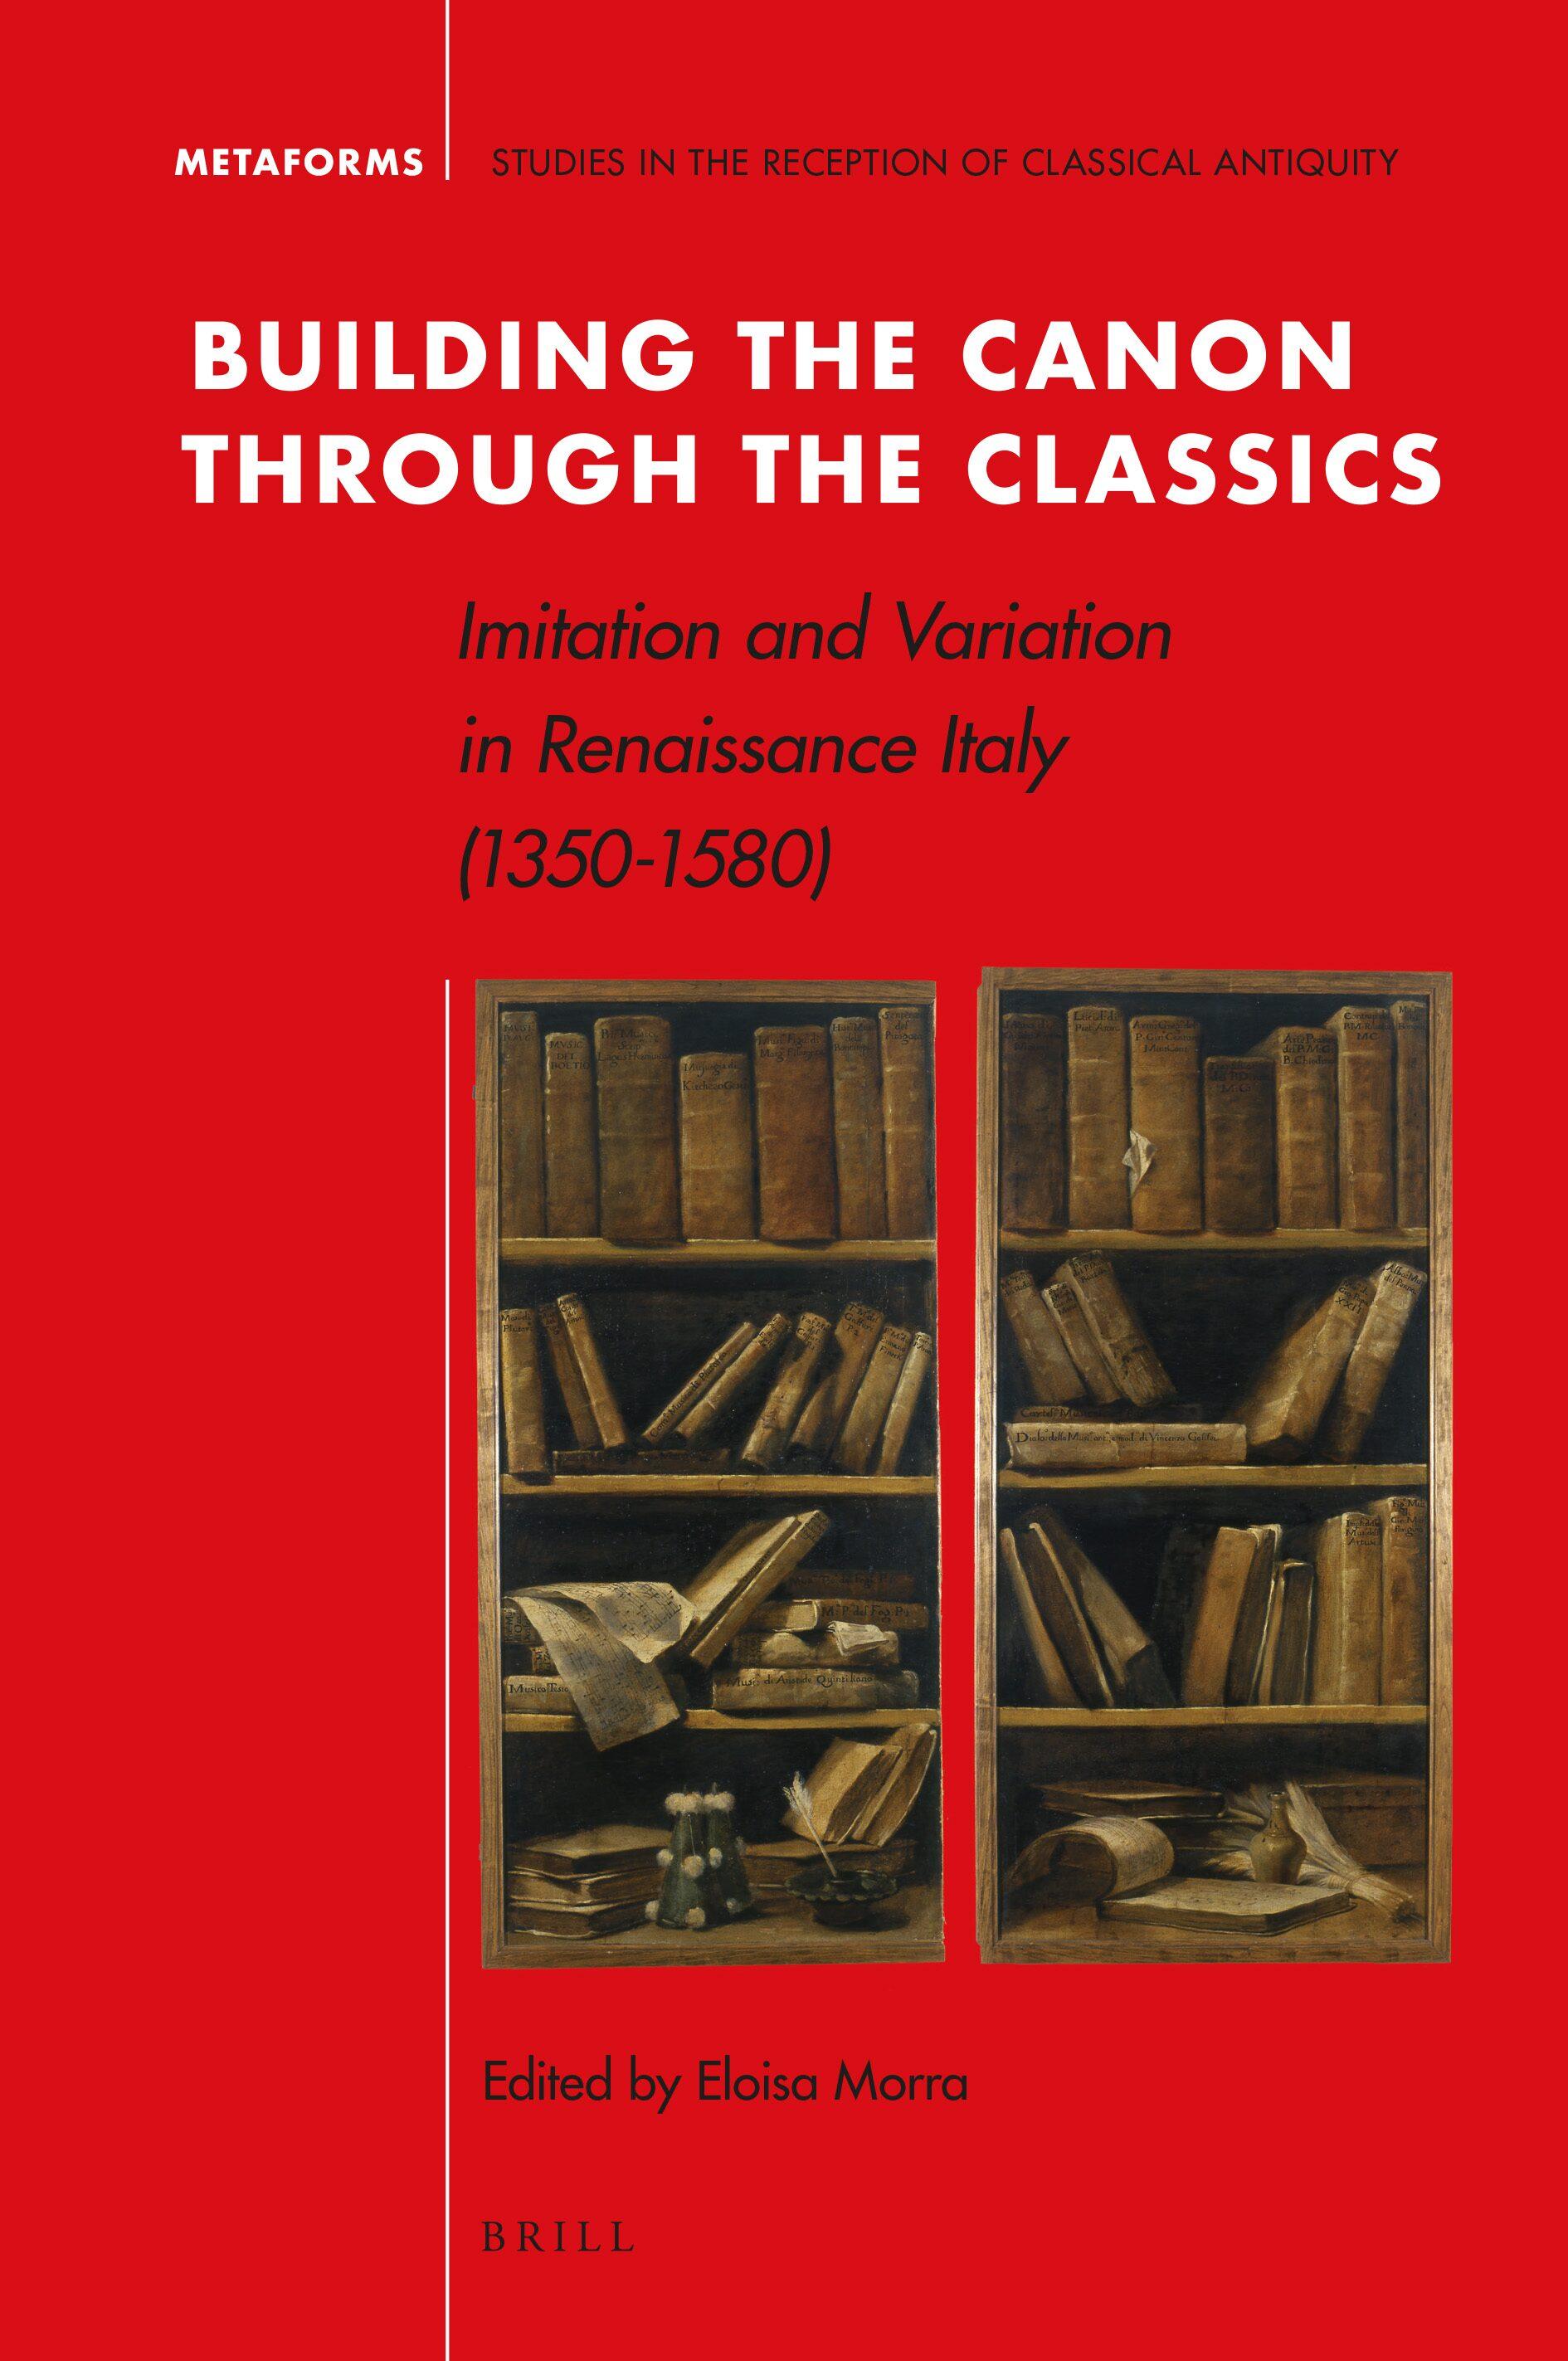 Nuova Accademia Del Design the literary canon and the visual arts: from the three